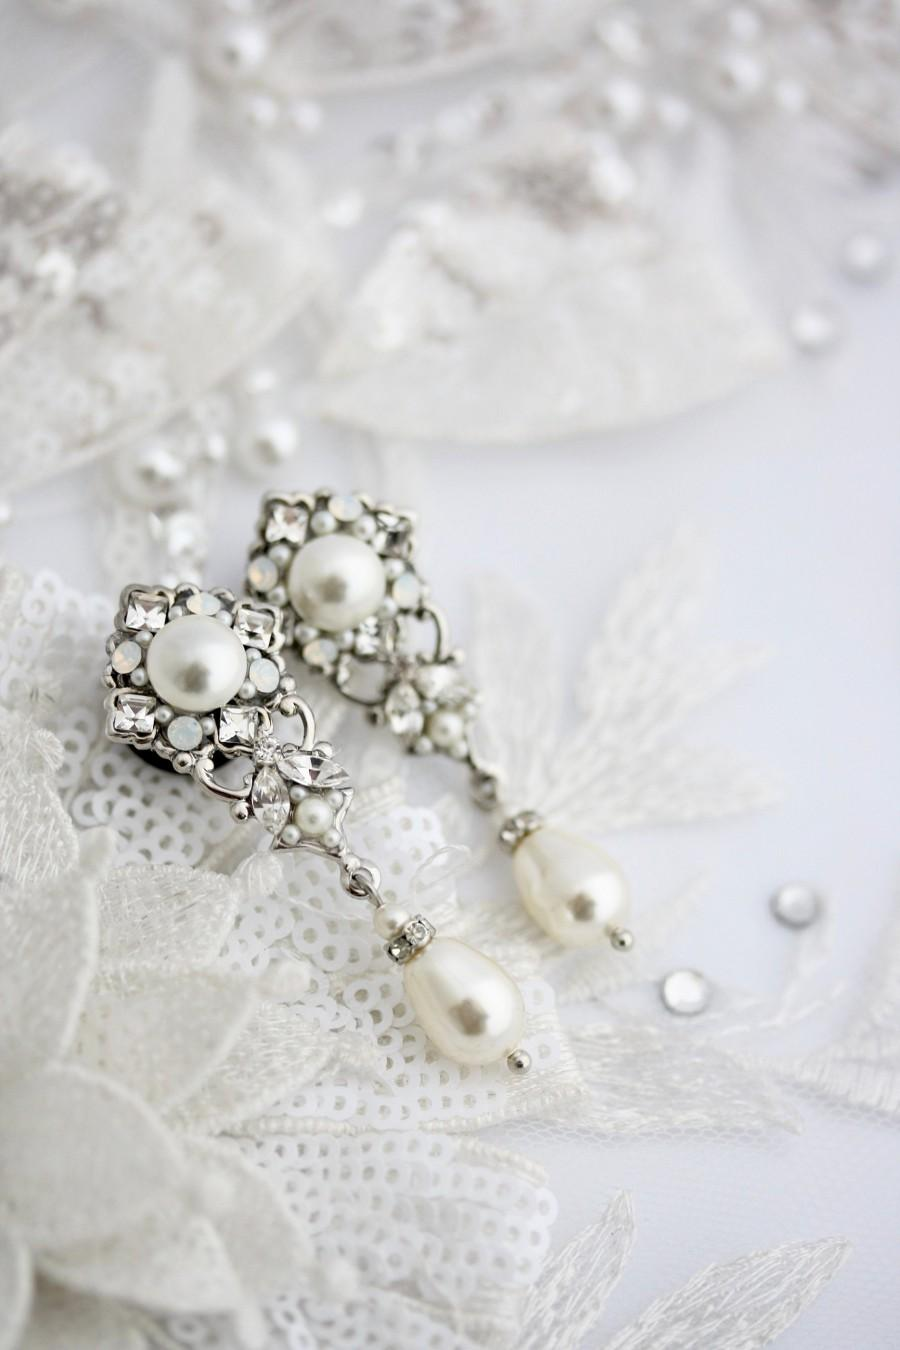 Wedding - Plug Earrings for Wedding Bridal Gauge Rose Custom Size Crystal and Pearl Jewelry Art Deco Dangle Earrings SWEENY